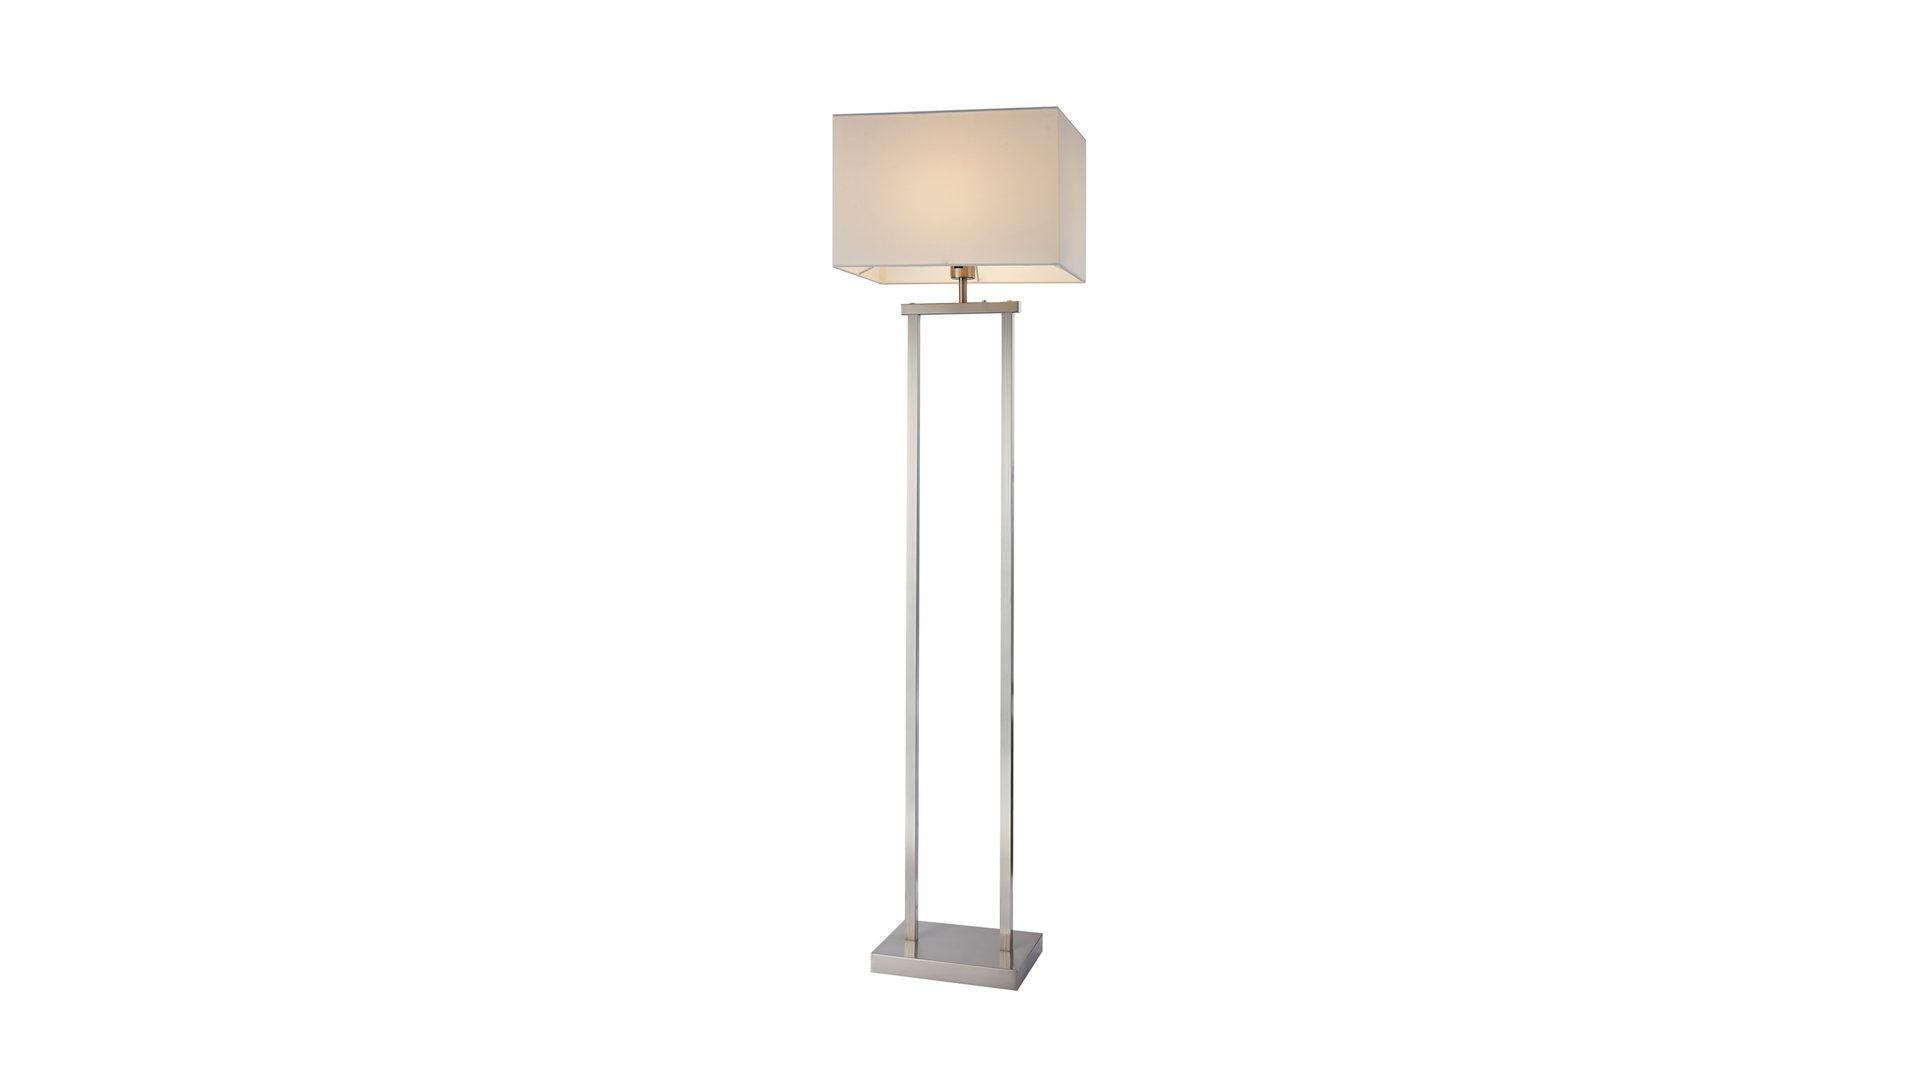 Led Stehleuchte Sydney Bzw Stehlampe Nickel Matt Kunststoff